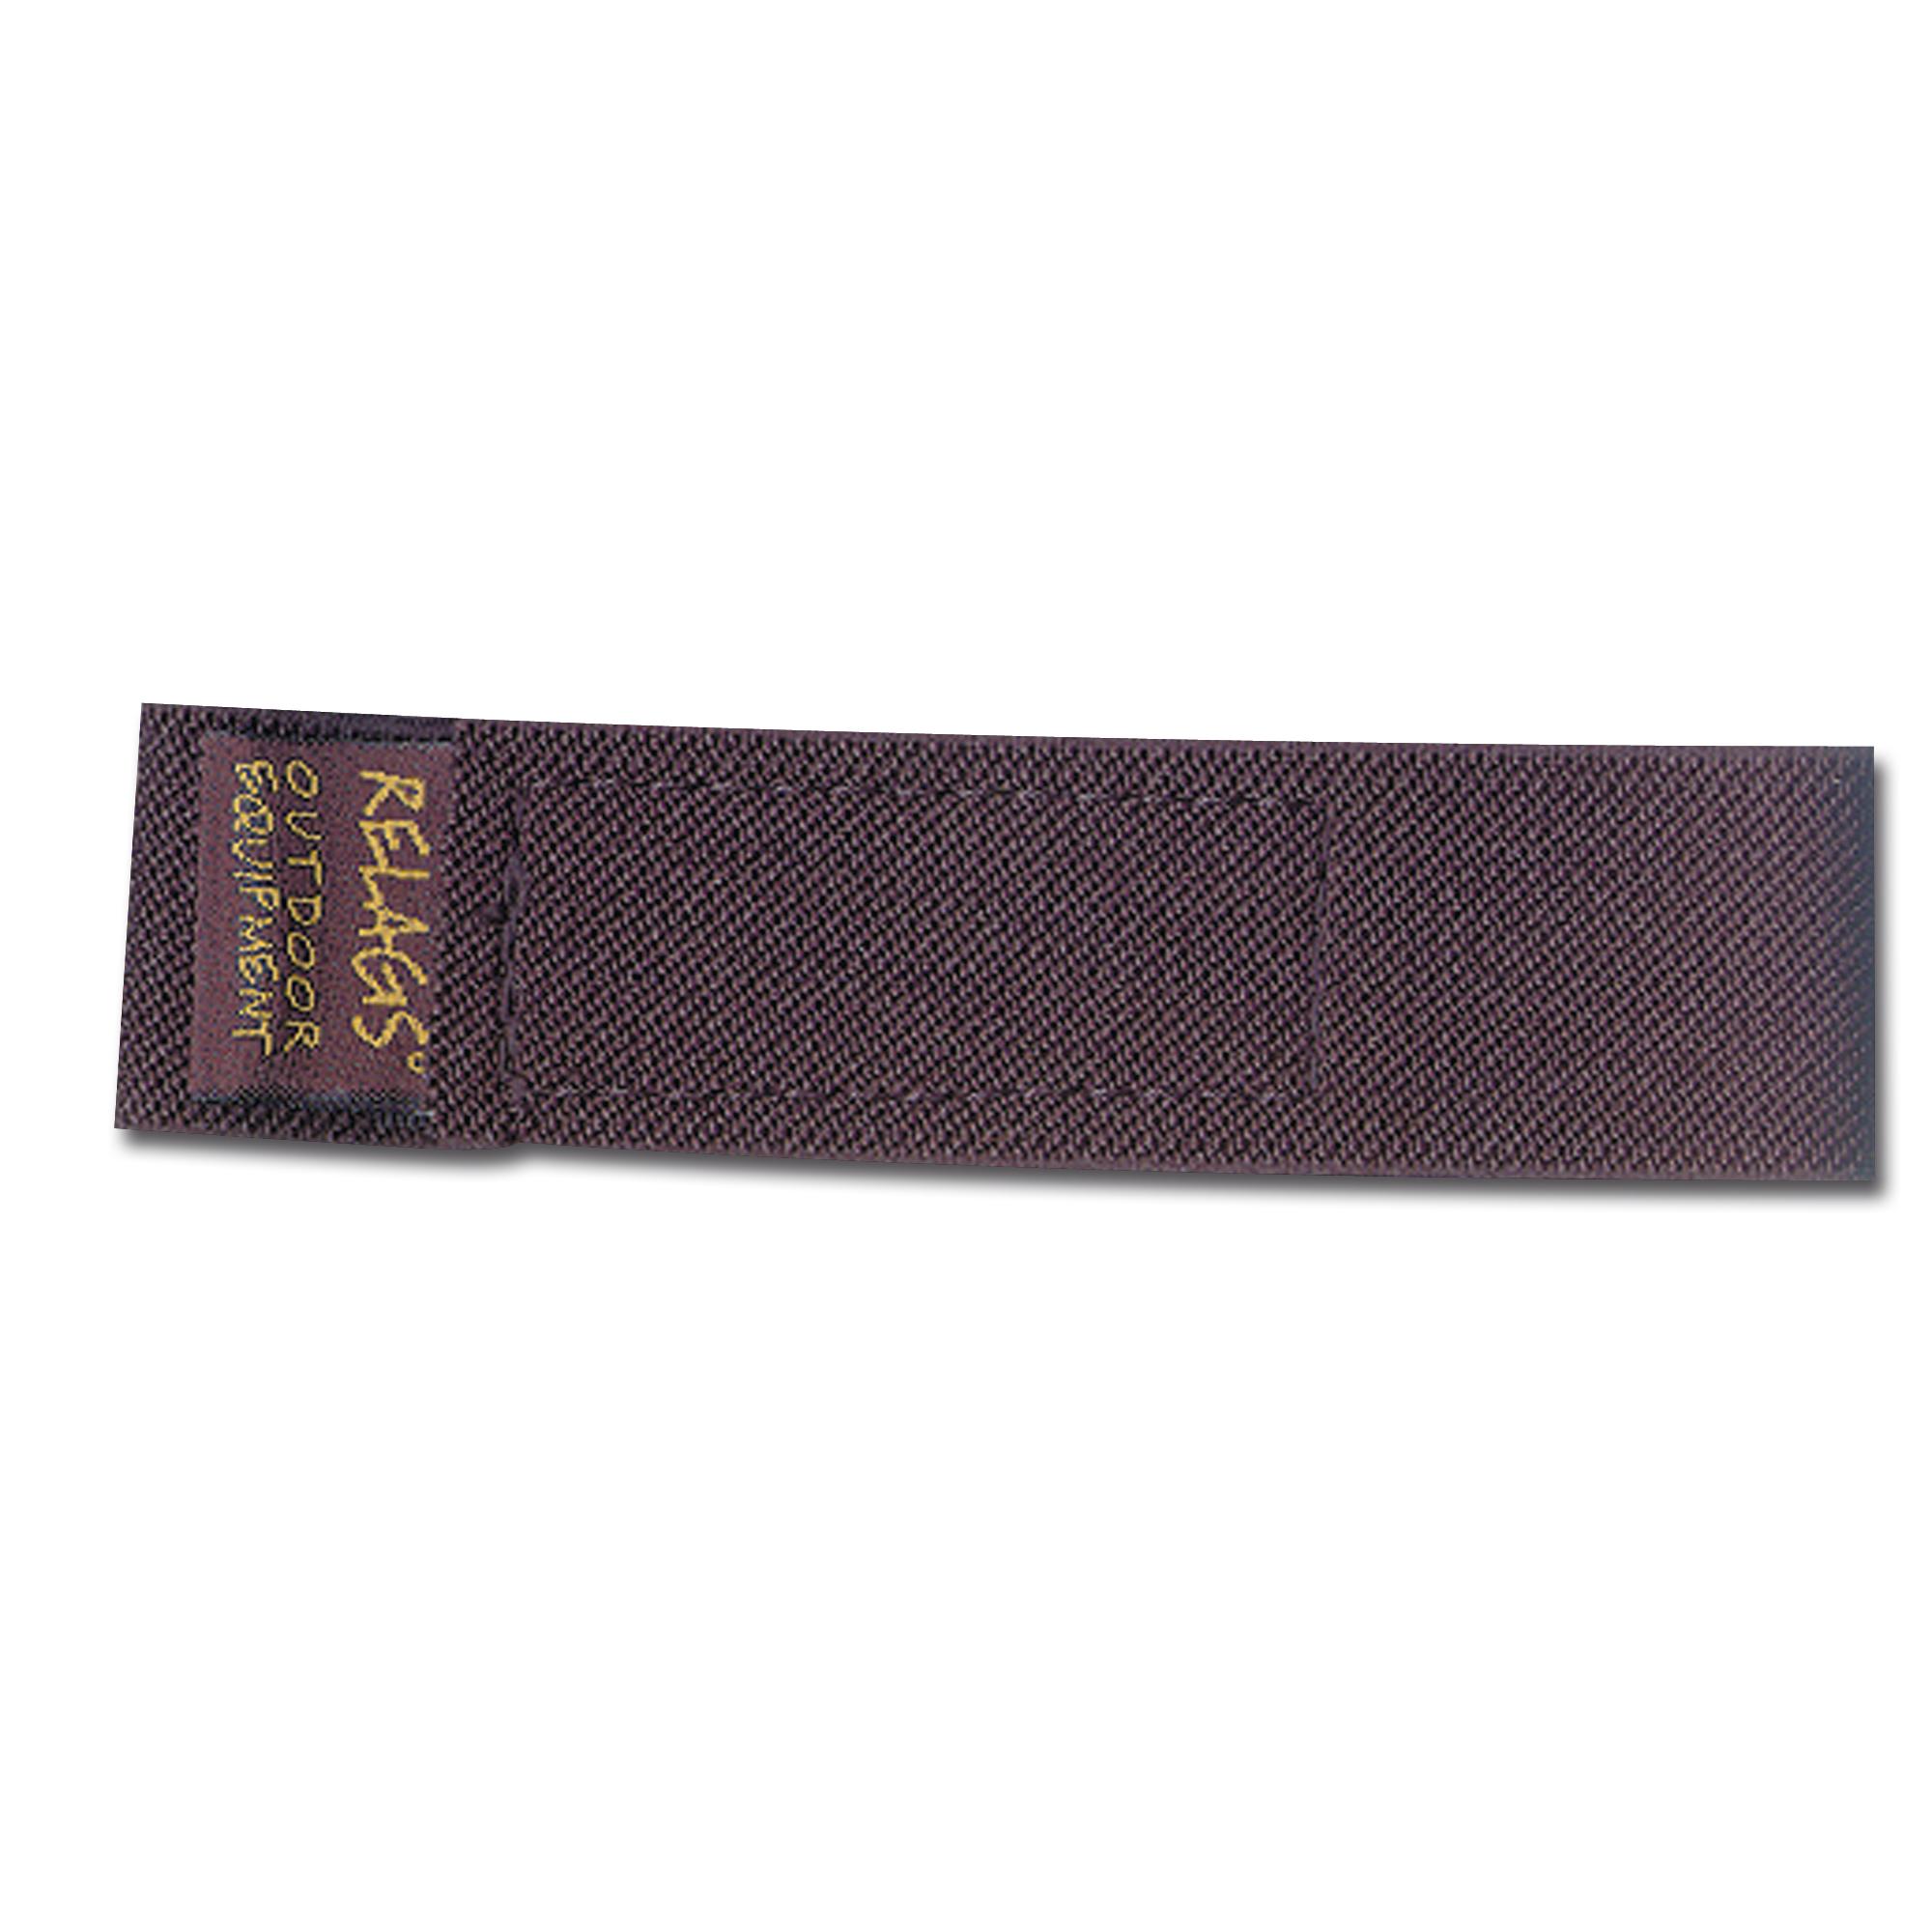 Strapits 40 cm black